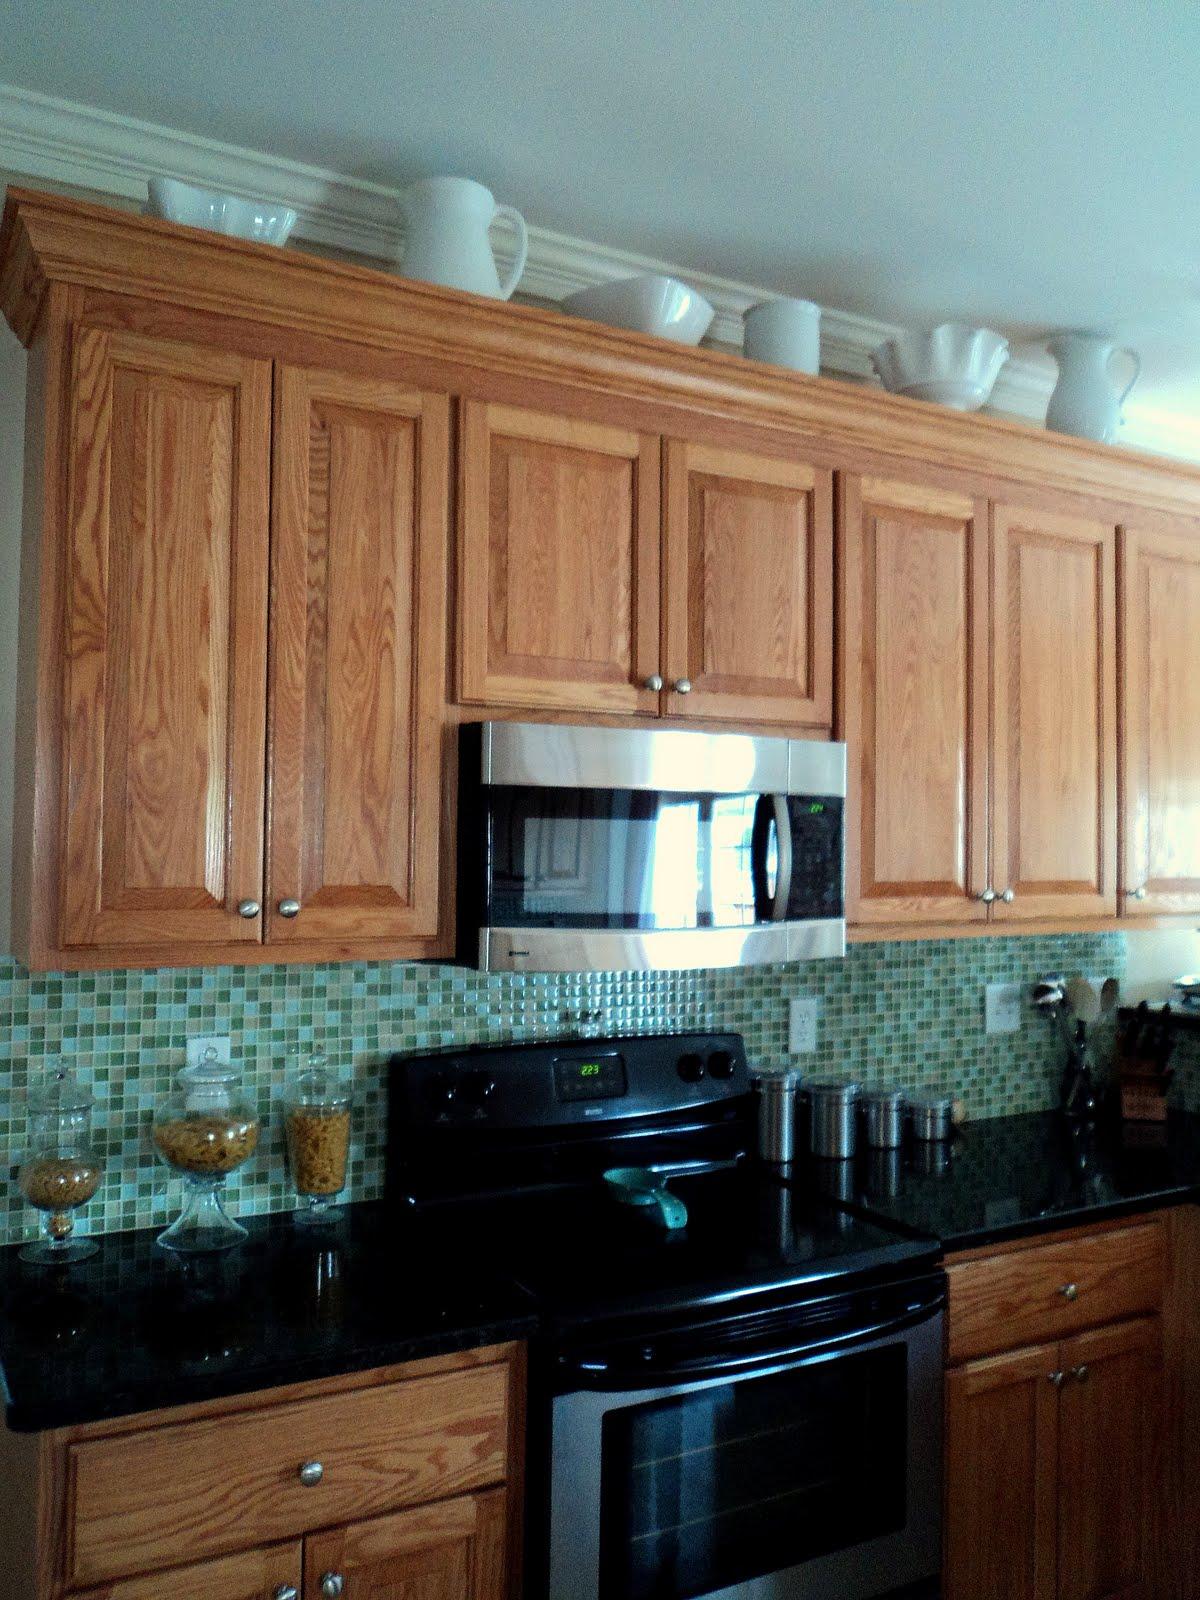 cabinet furniture richmond thrifter who has weird space above their kitchen